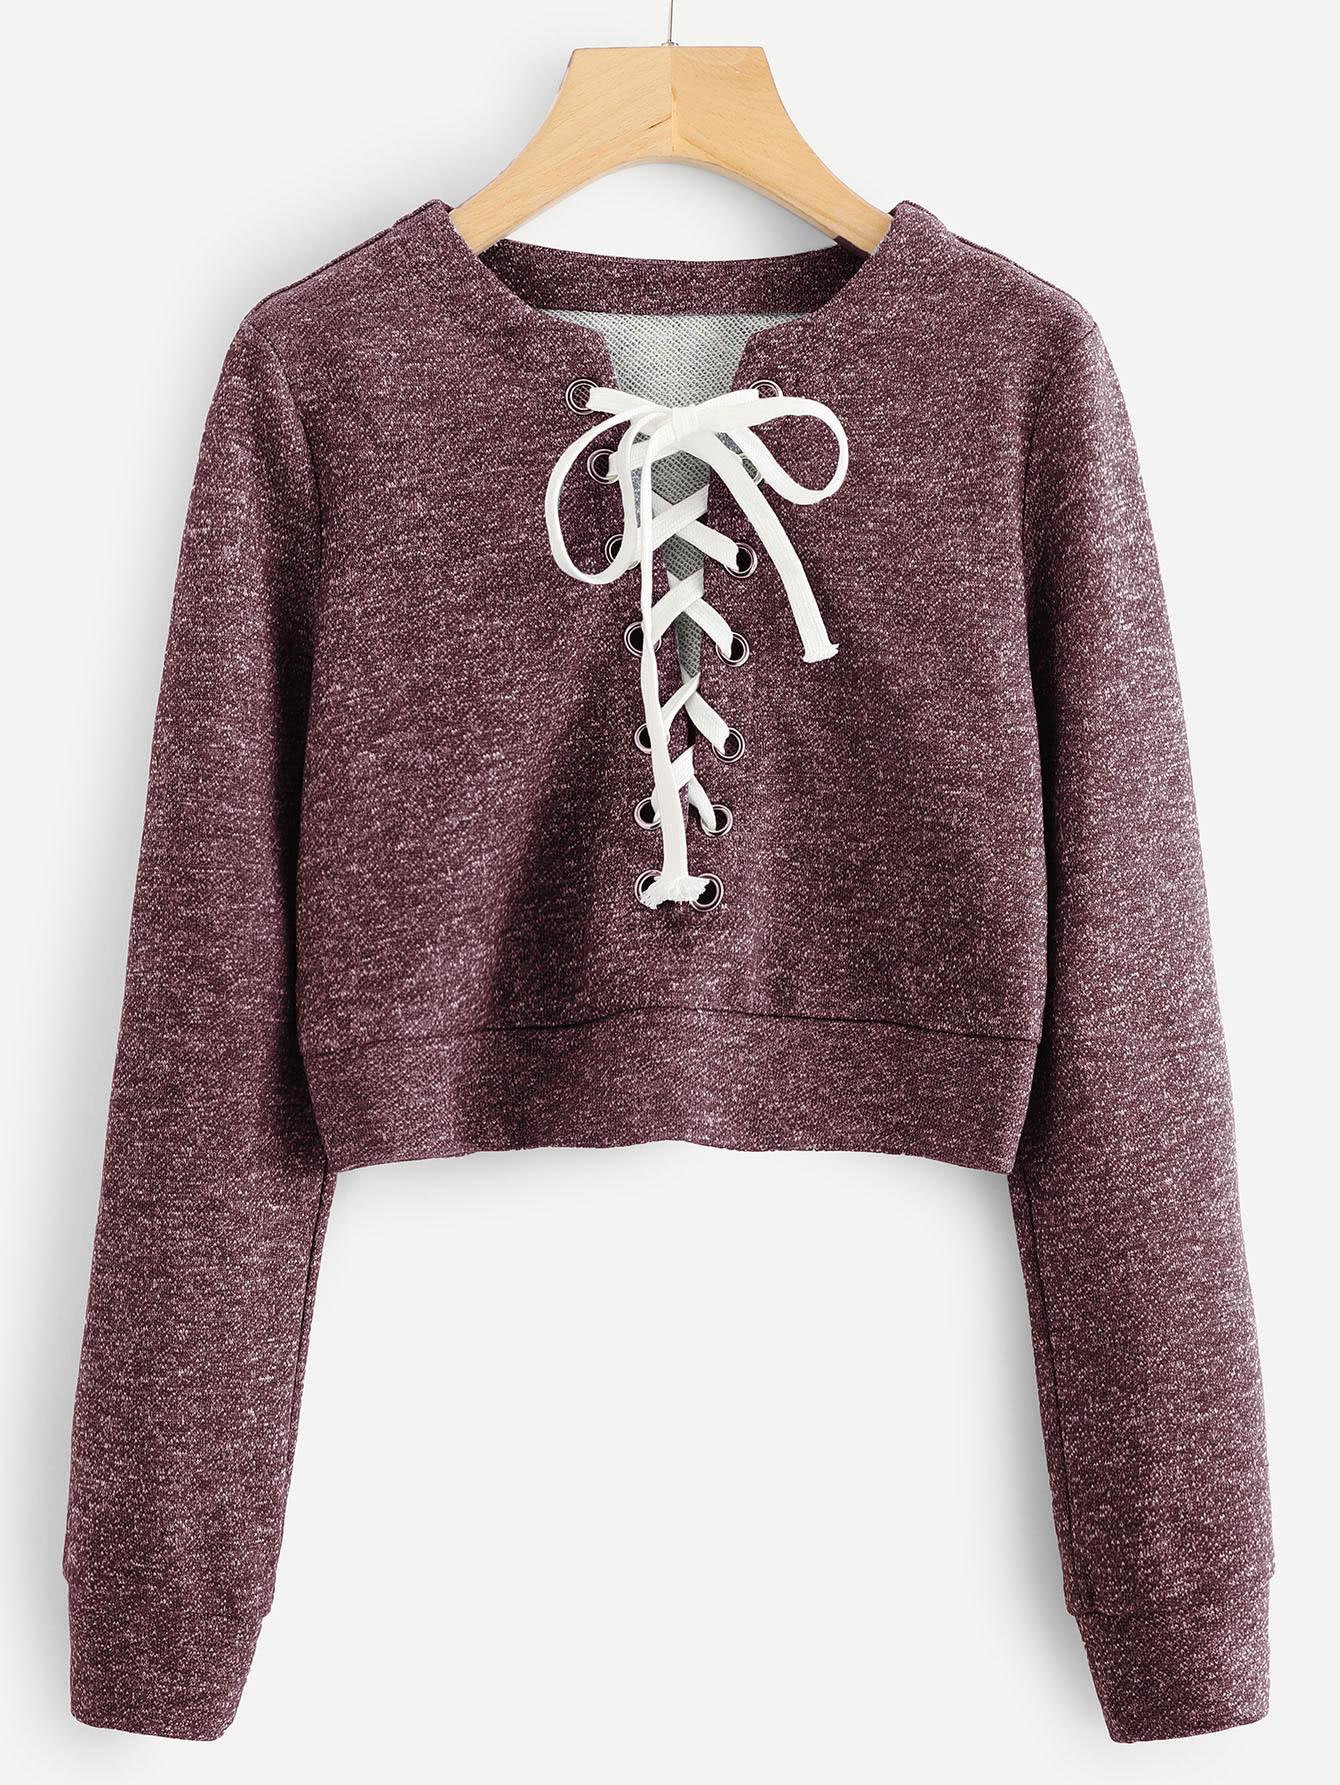 Grommet Lace Up Marled Knit Crop Sweatshirt drop shoulder letter print marled crop sweatshirt